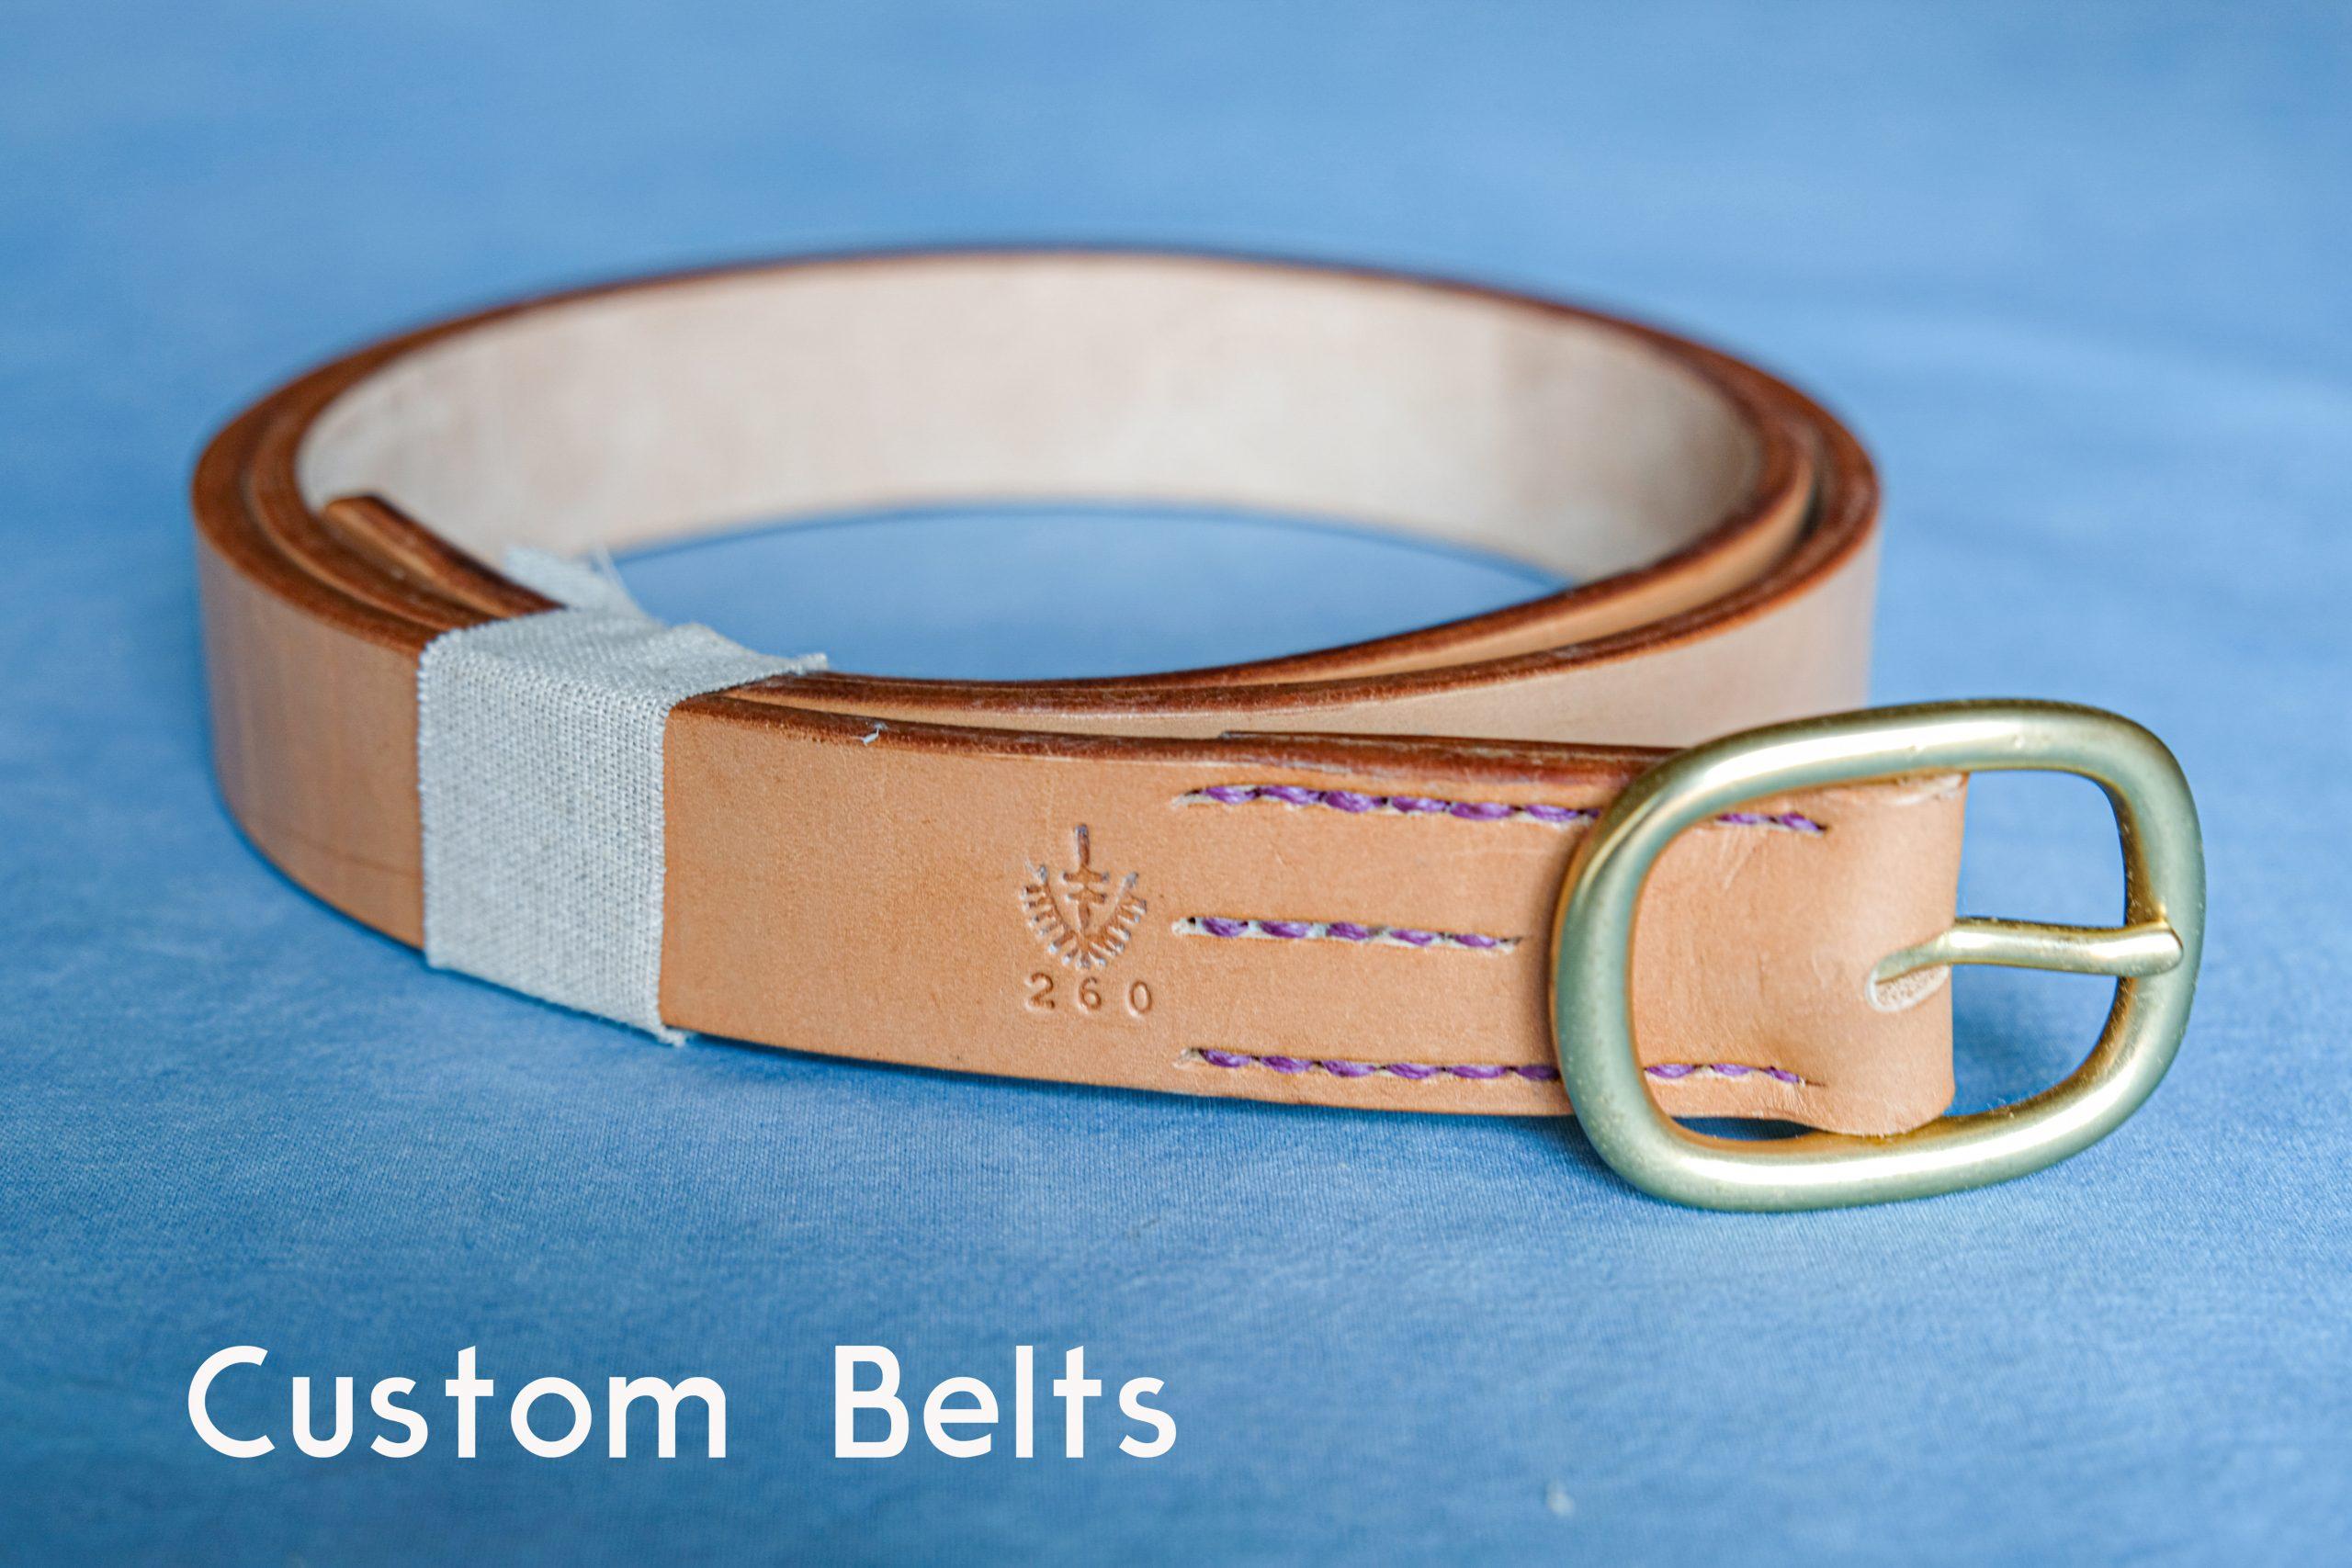 lerif designs custom leather belt with brass buckle on blue background